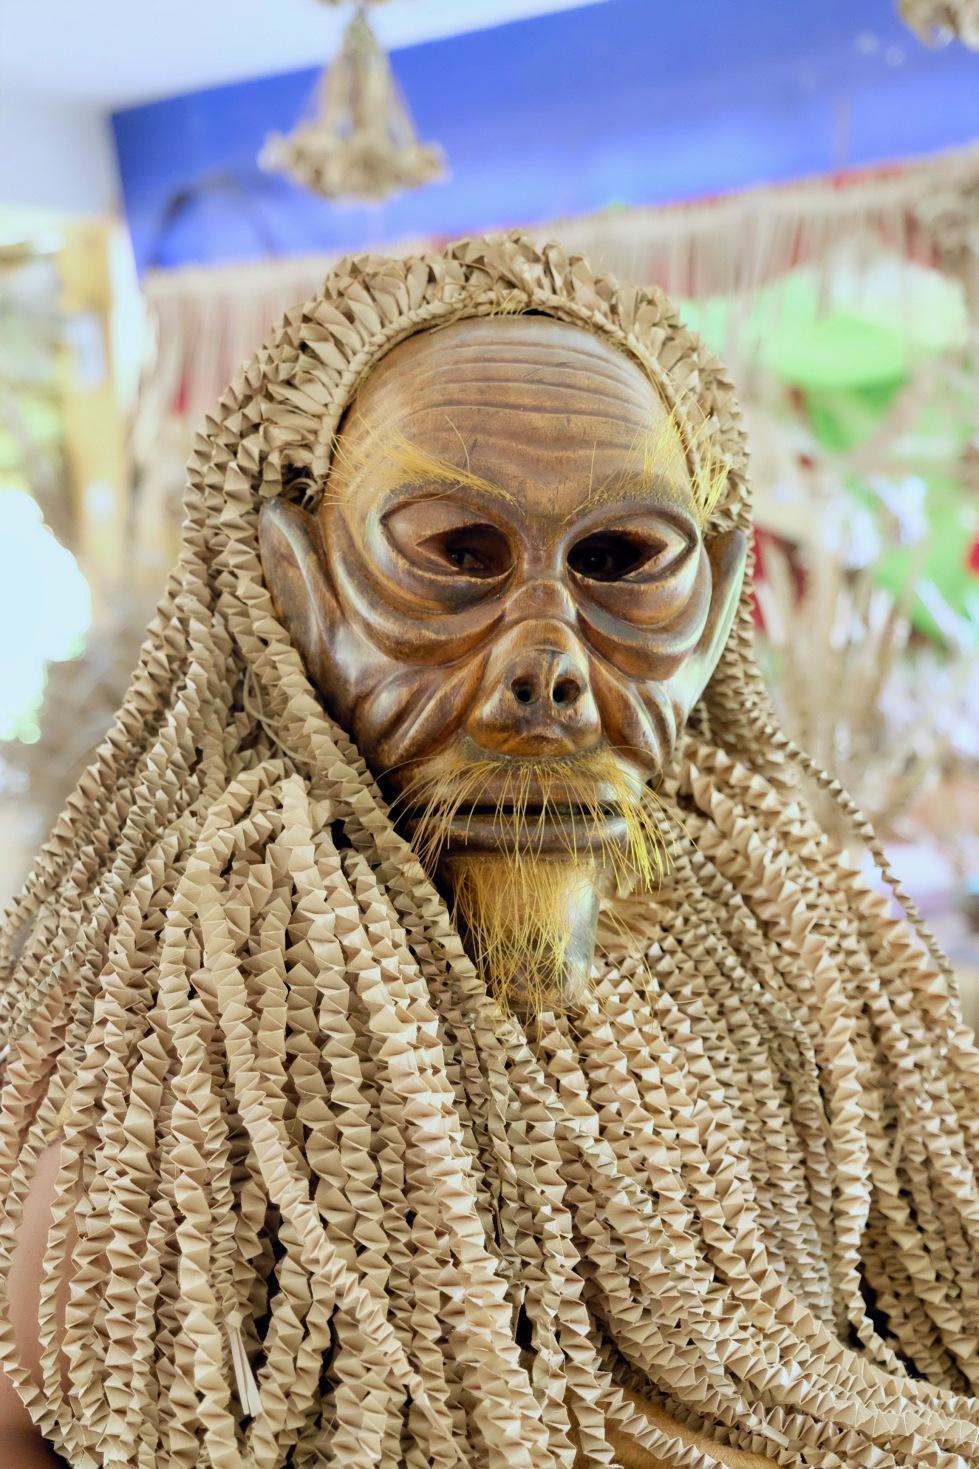 Mah Meri Masked Man